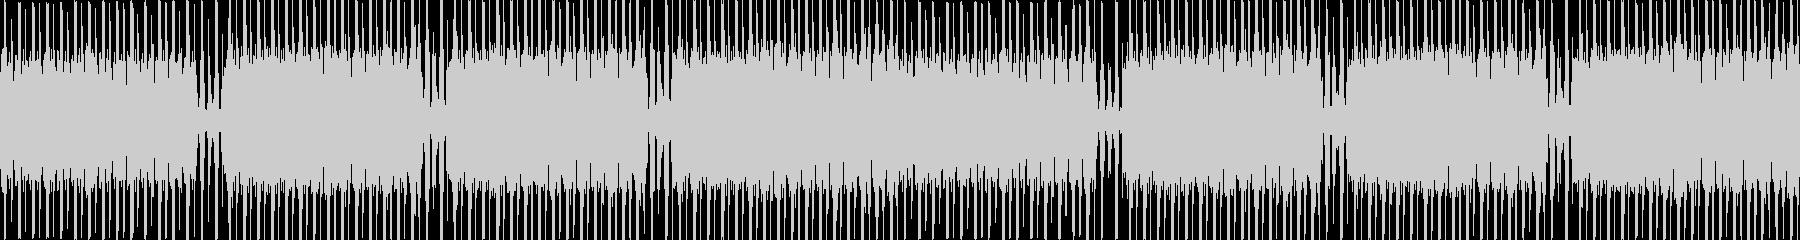 Loop仕様のテクノミュージックの未再生の波形